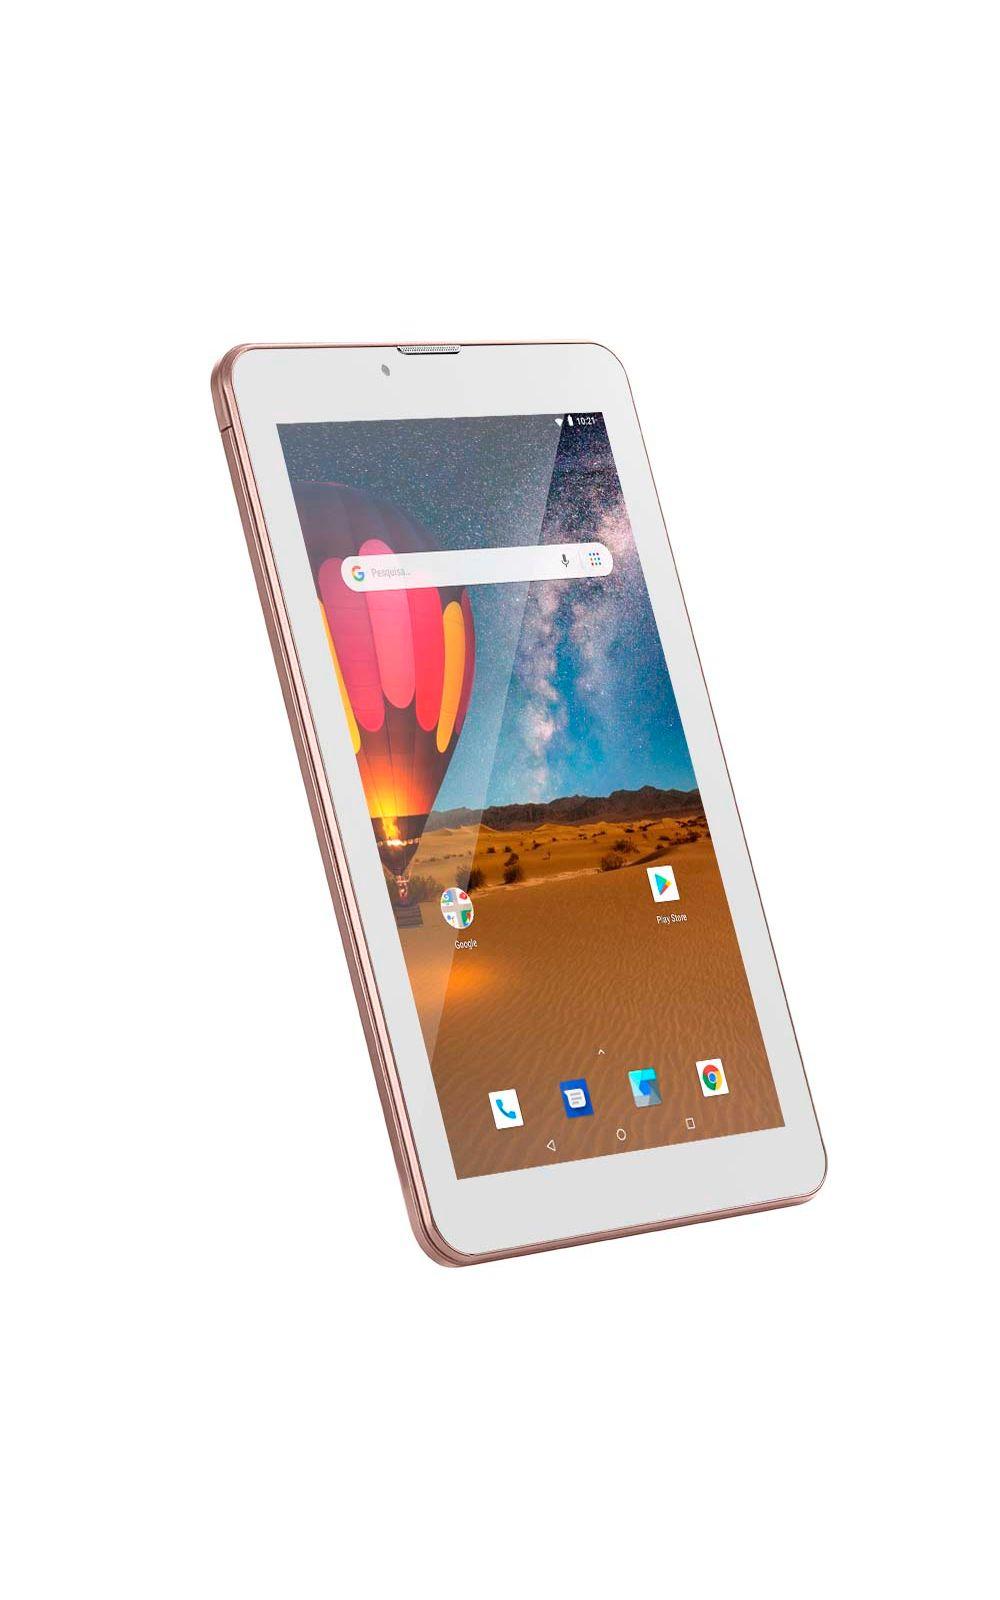 Foto 7 - Tablet Multilaser M7 3G Plus Dual Chip Quad Core 1 GB de Ram Memória 16 GB Tela 7 Polegadas Rosa - NB305